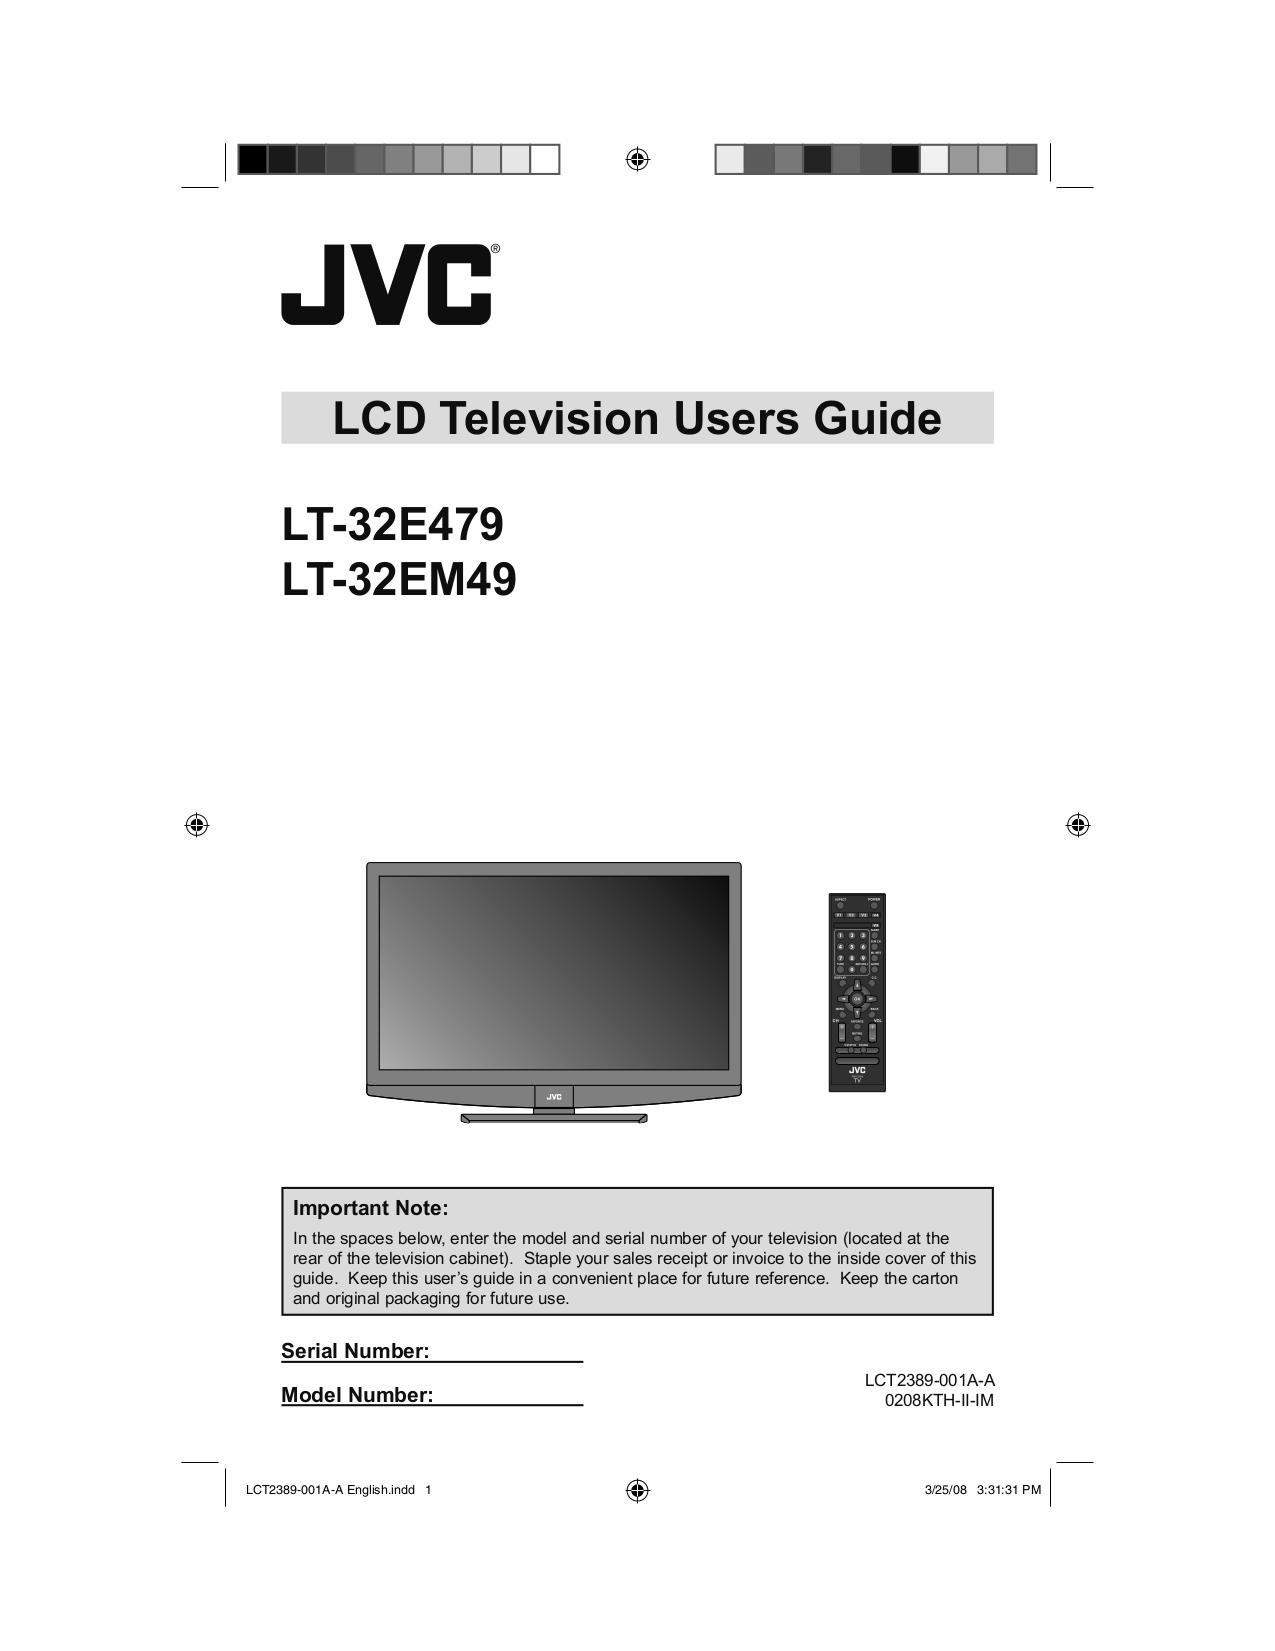 Jvc gr-c1 eg vhs camcorder sm service manual download, schematics.